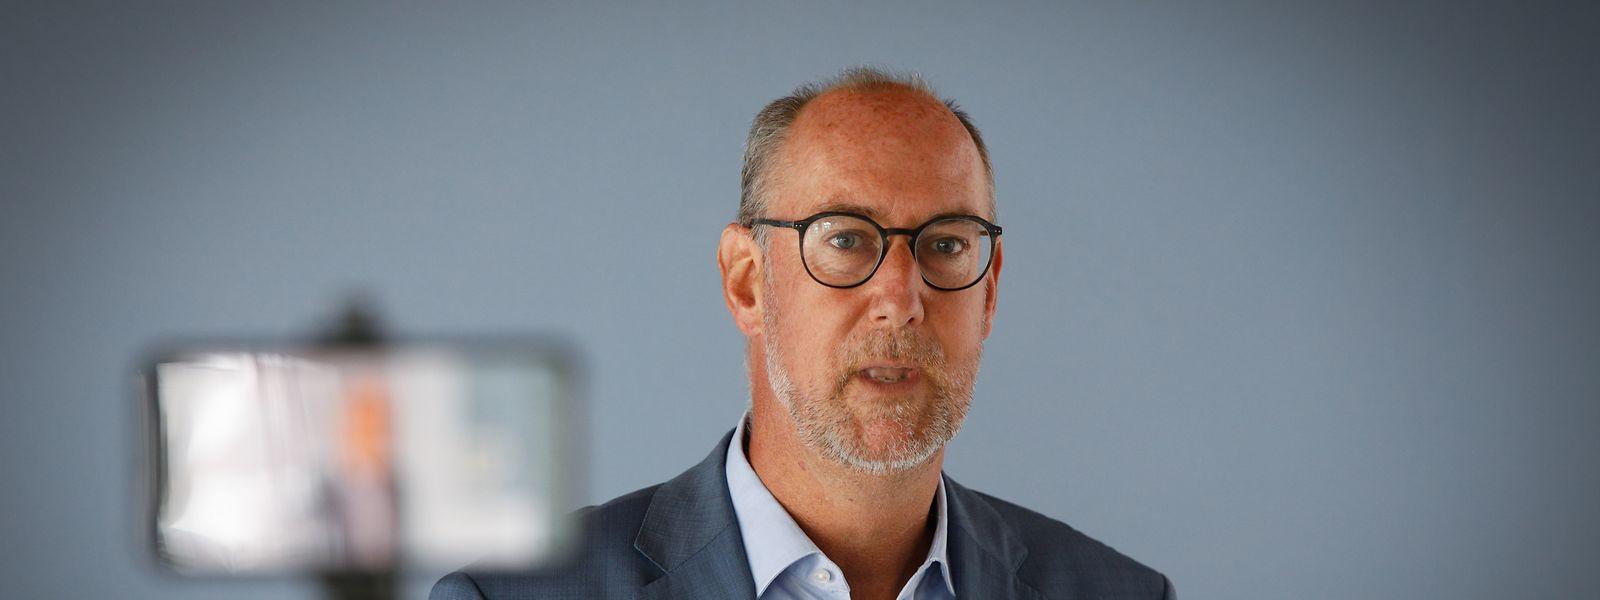 Gilles Baum steht seit Januar an der Spitze der DP-Fraktion.